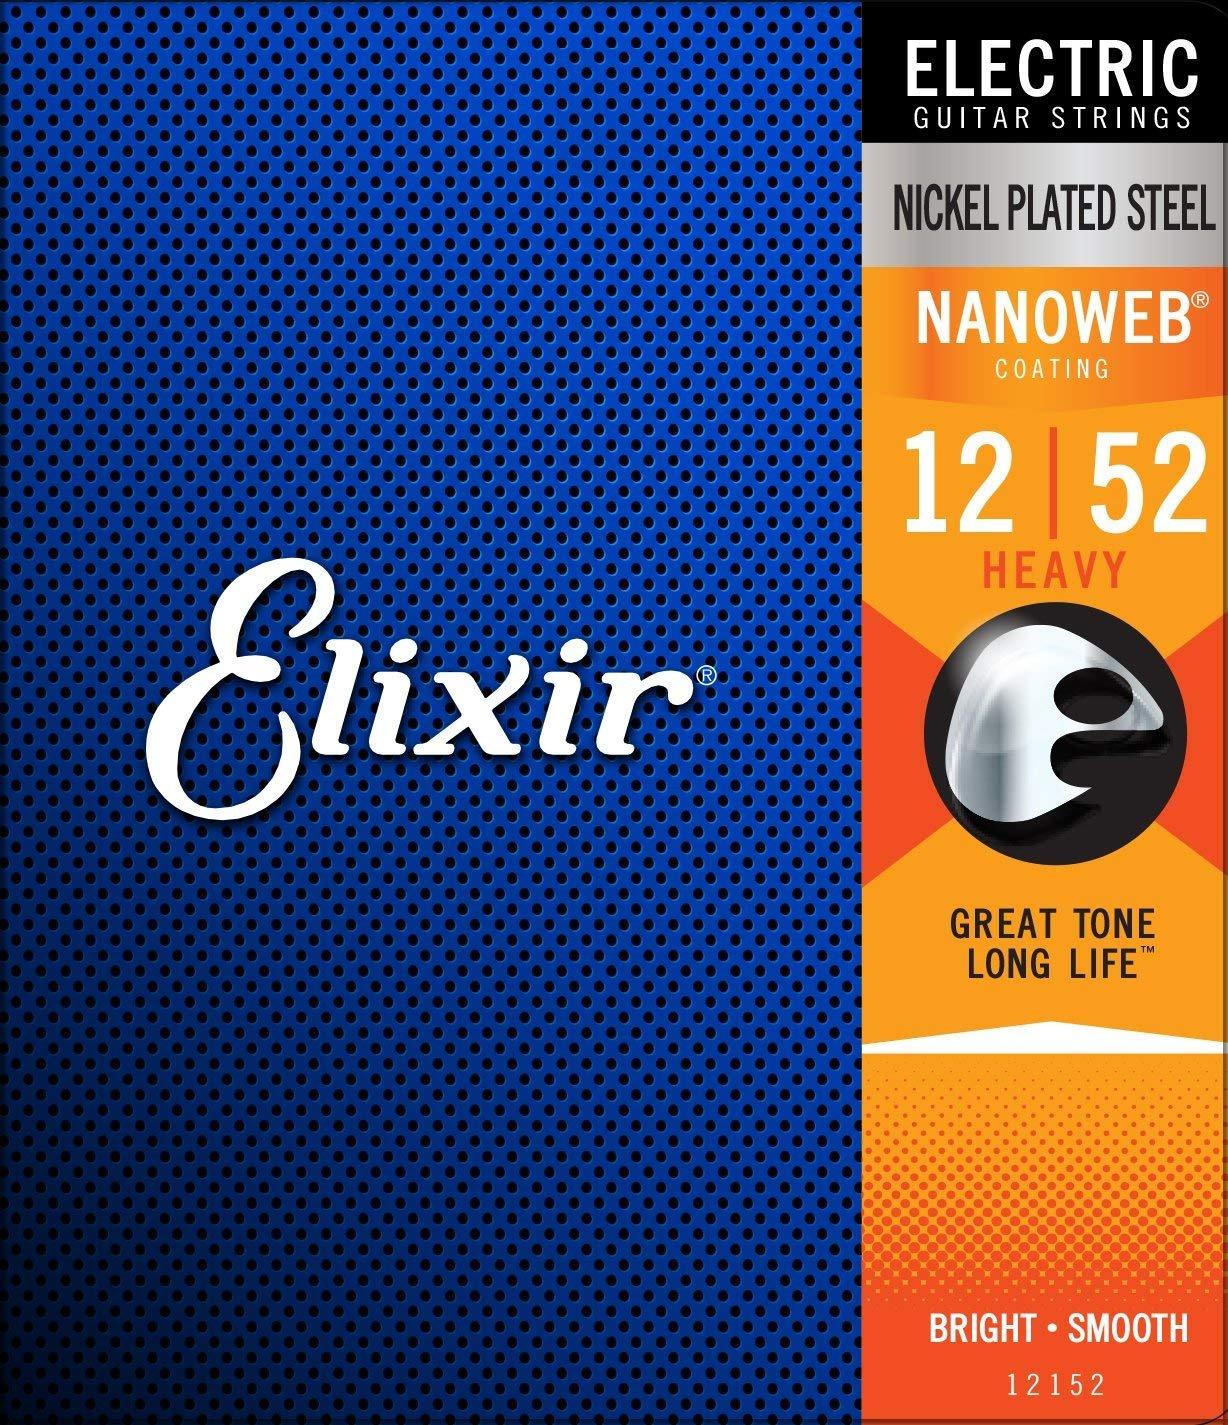 Elixir Nickel Plated Steel Nanoweb Electric, Heavy